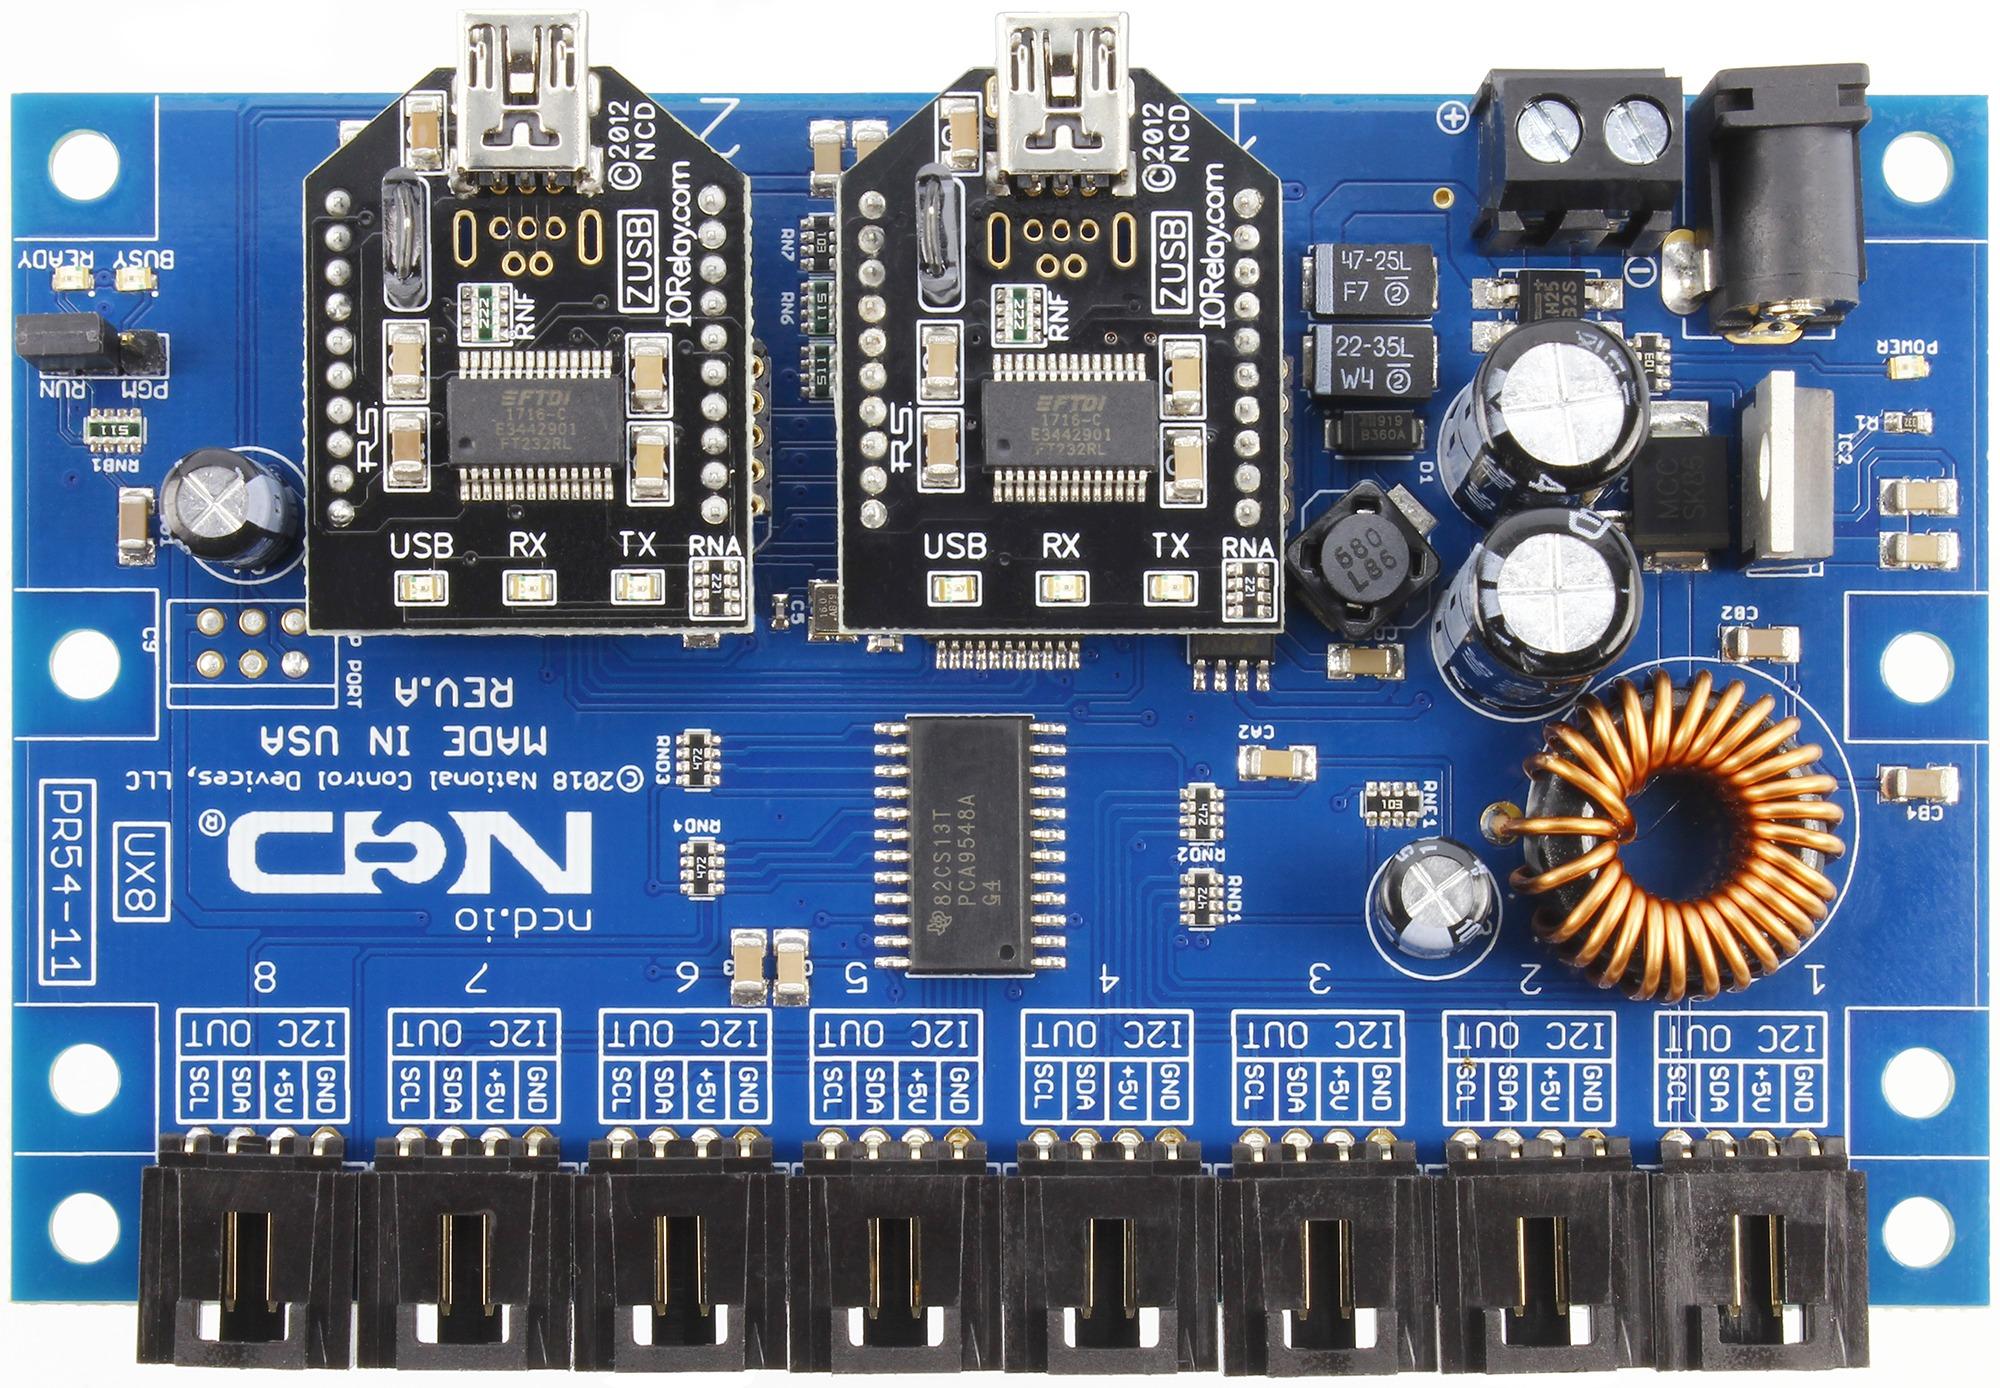 Dual USB to 8-Port Hardware I2C Converter endNode - store ncd io